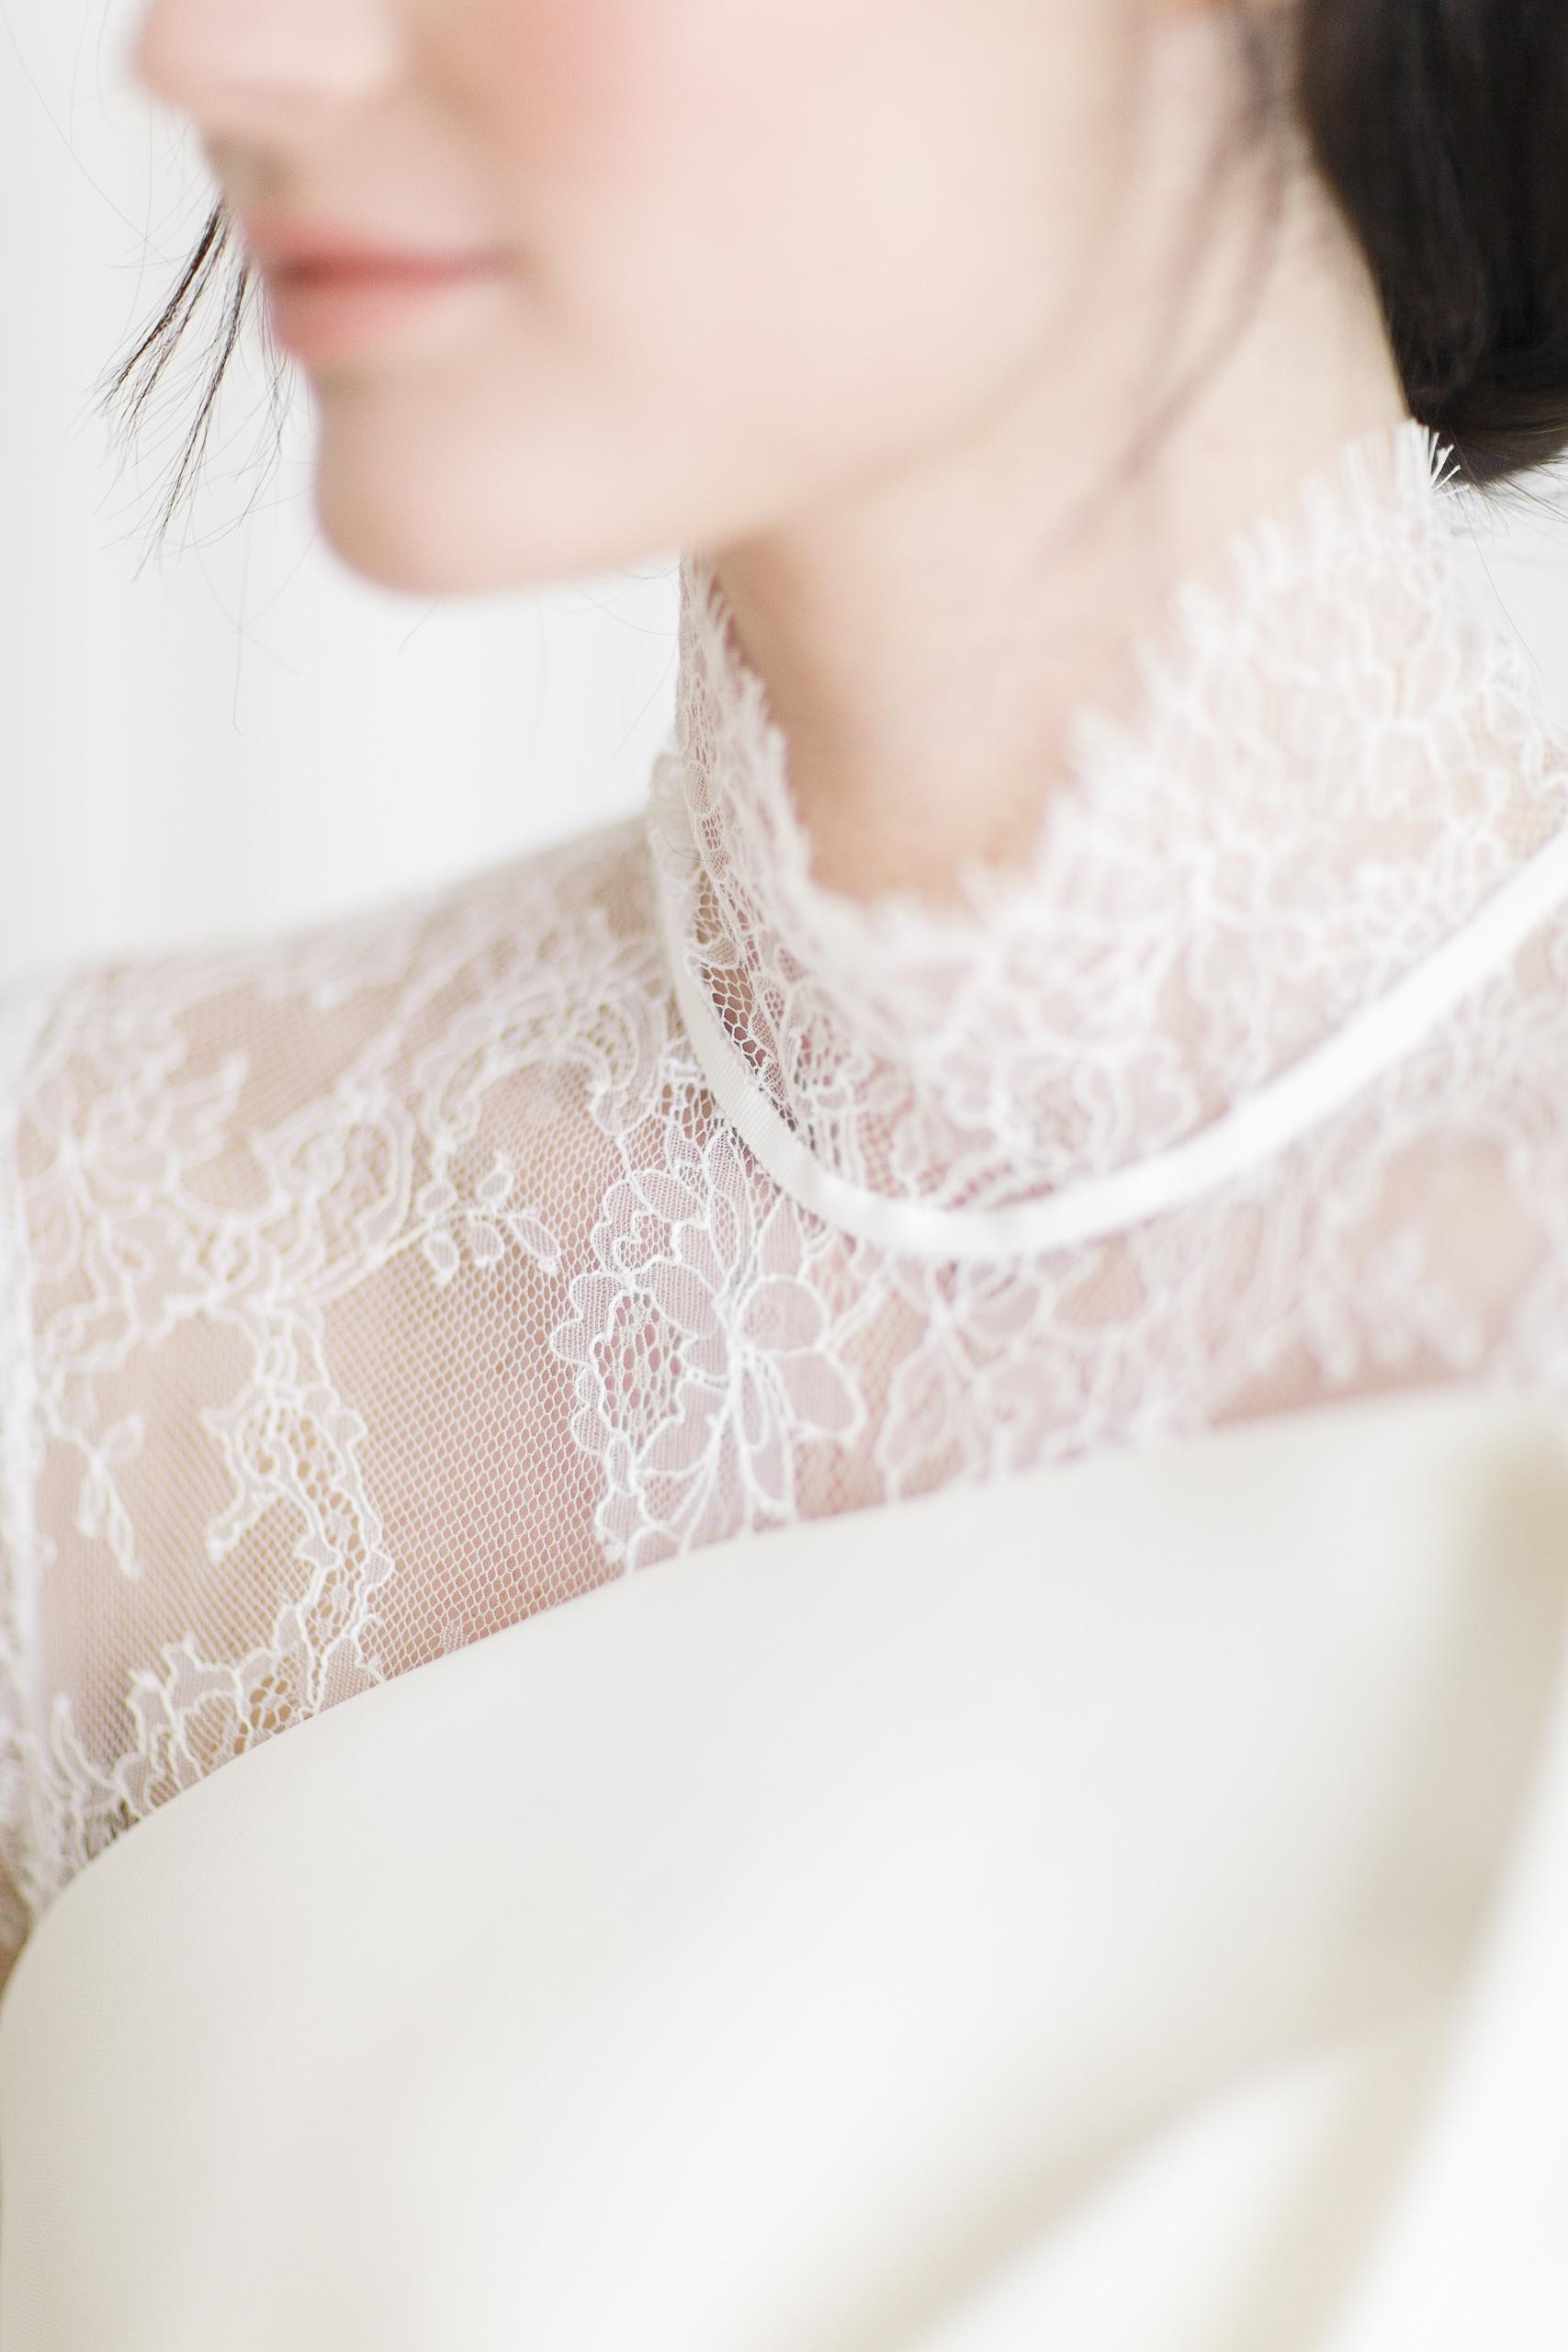 Ludovic Grau-Mingot - Film Photographer - Talitha - Wedding dresses - Collection 2019-37 (1).jpg